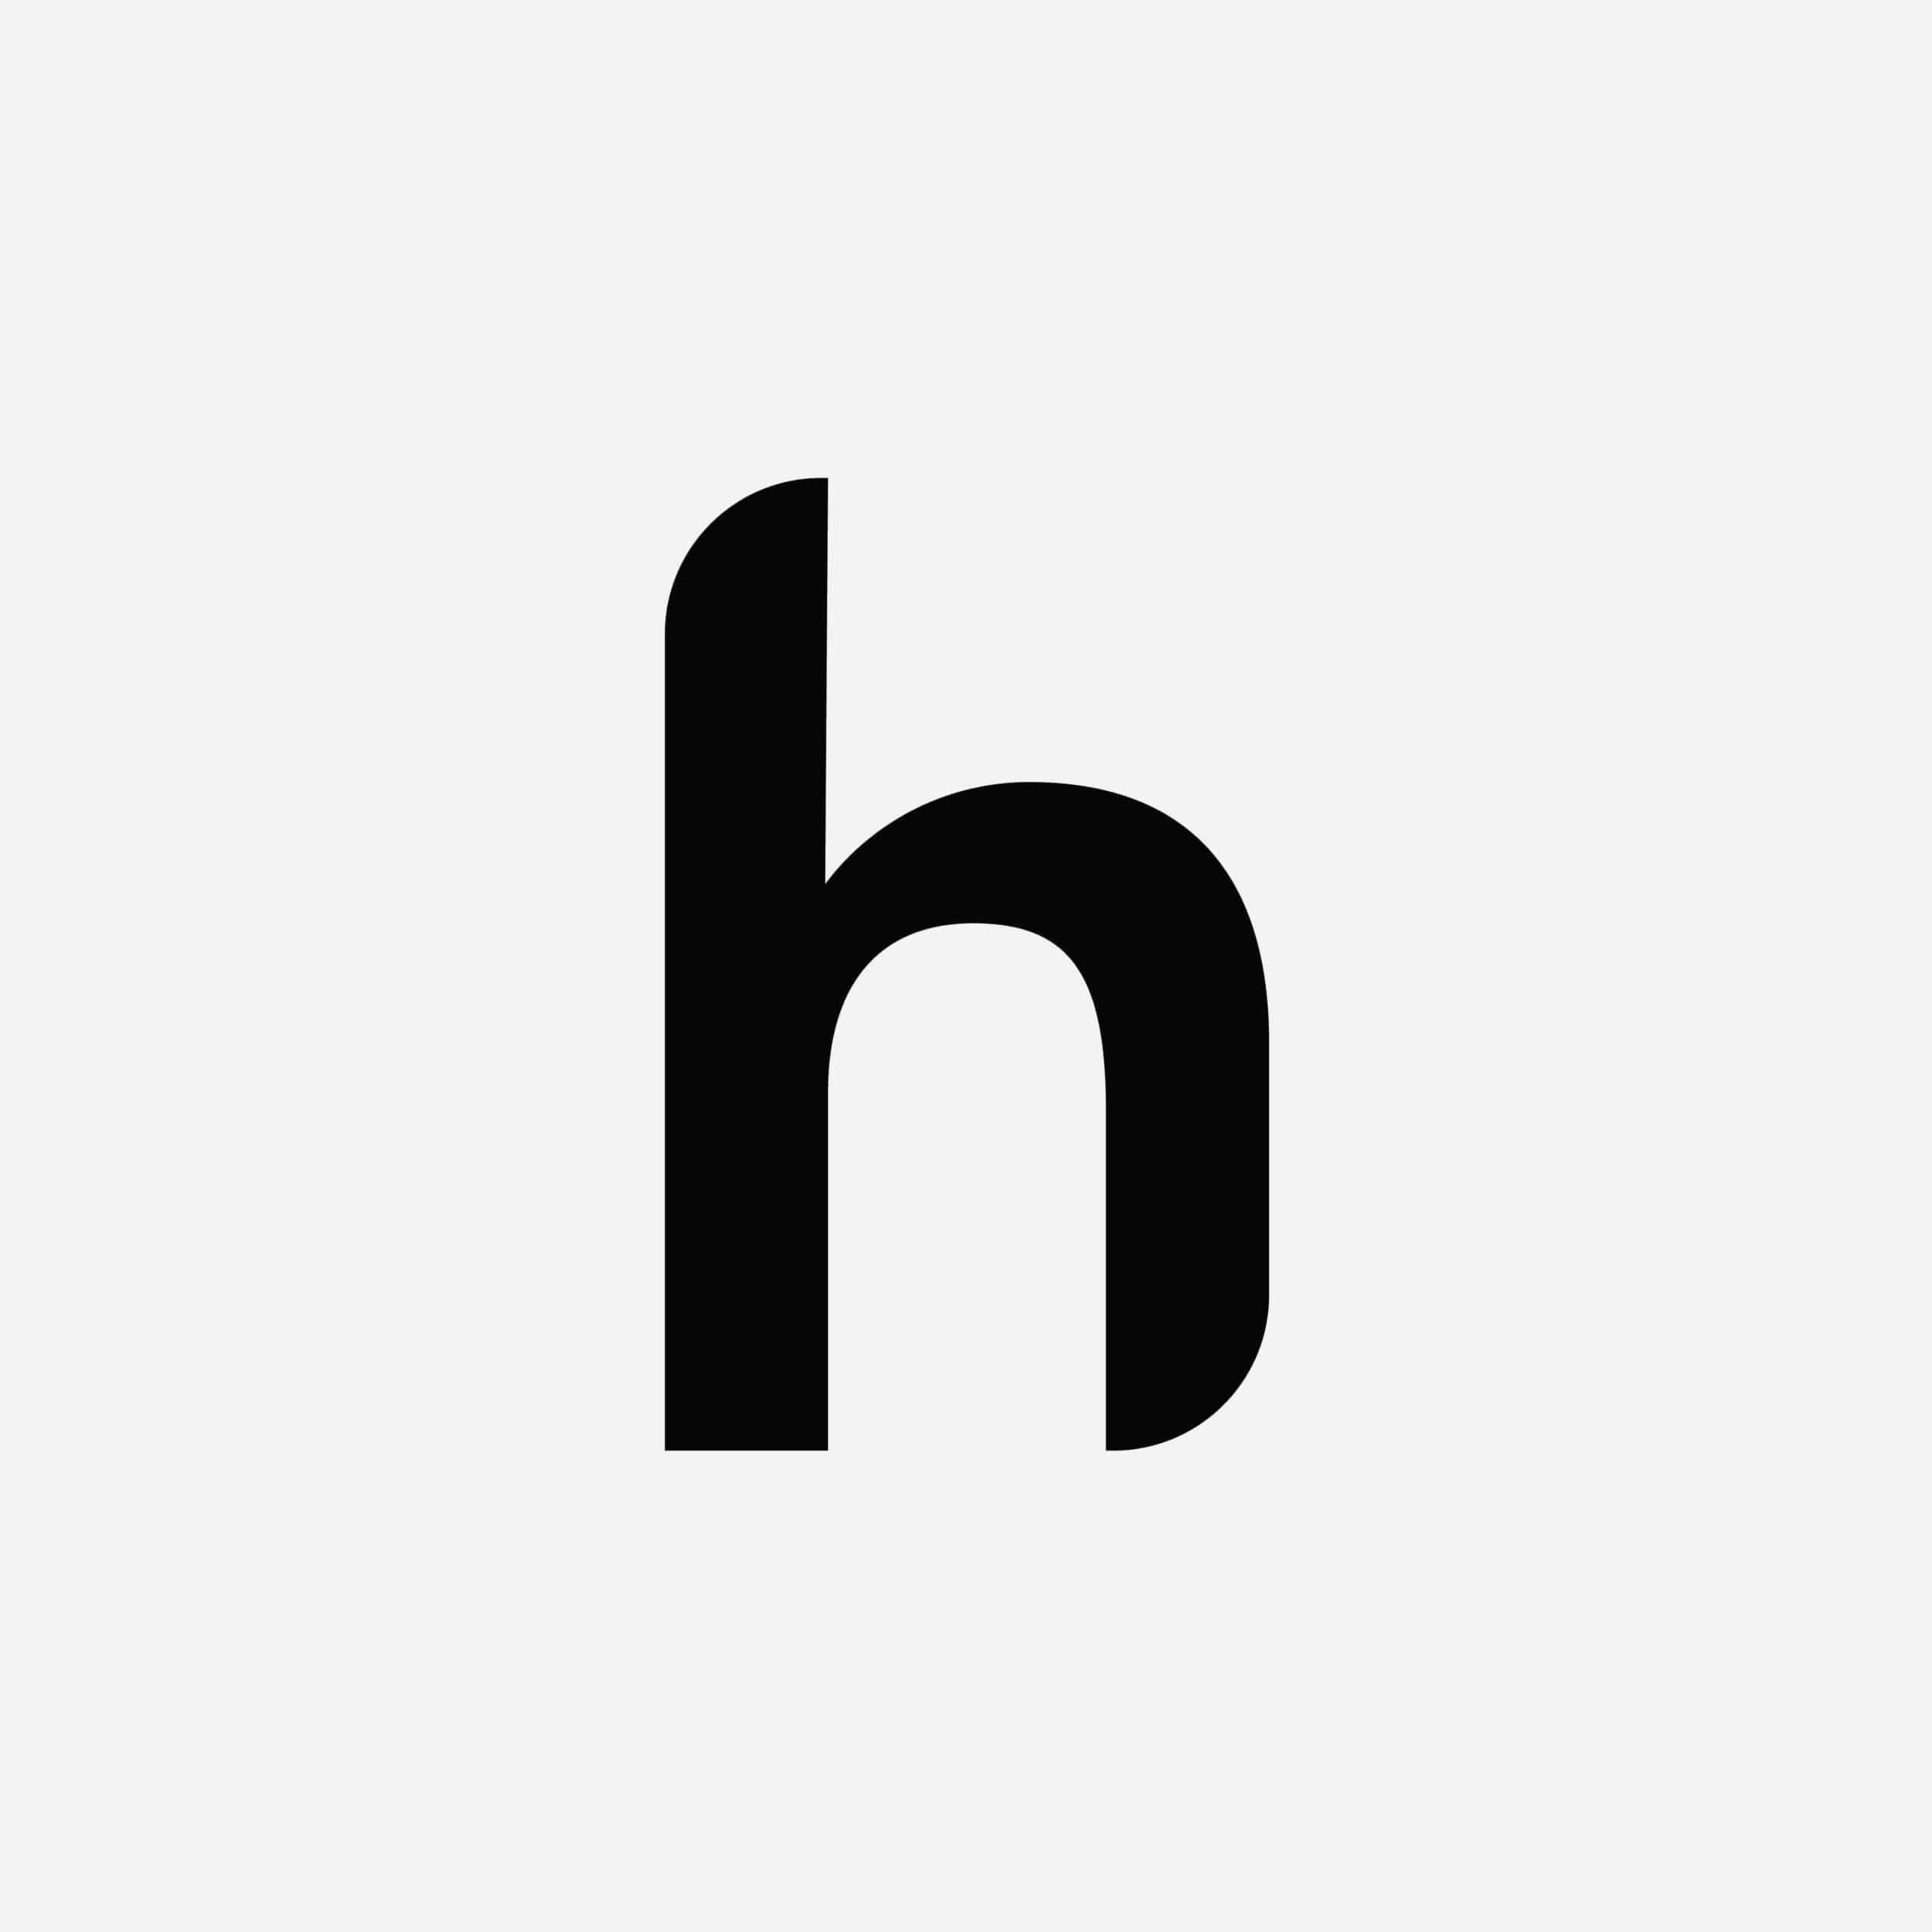 Human_Branding_By_Stellen_Design_Logo_Design_Profile